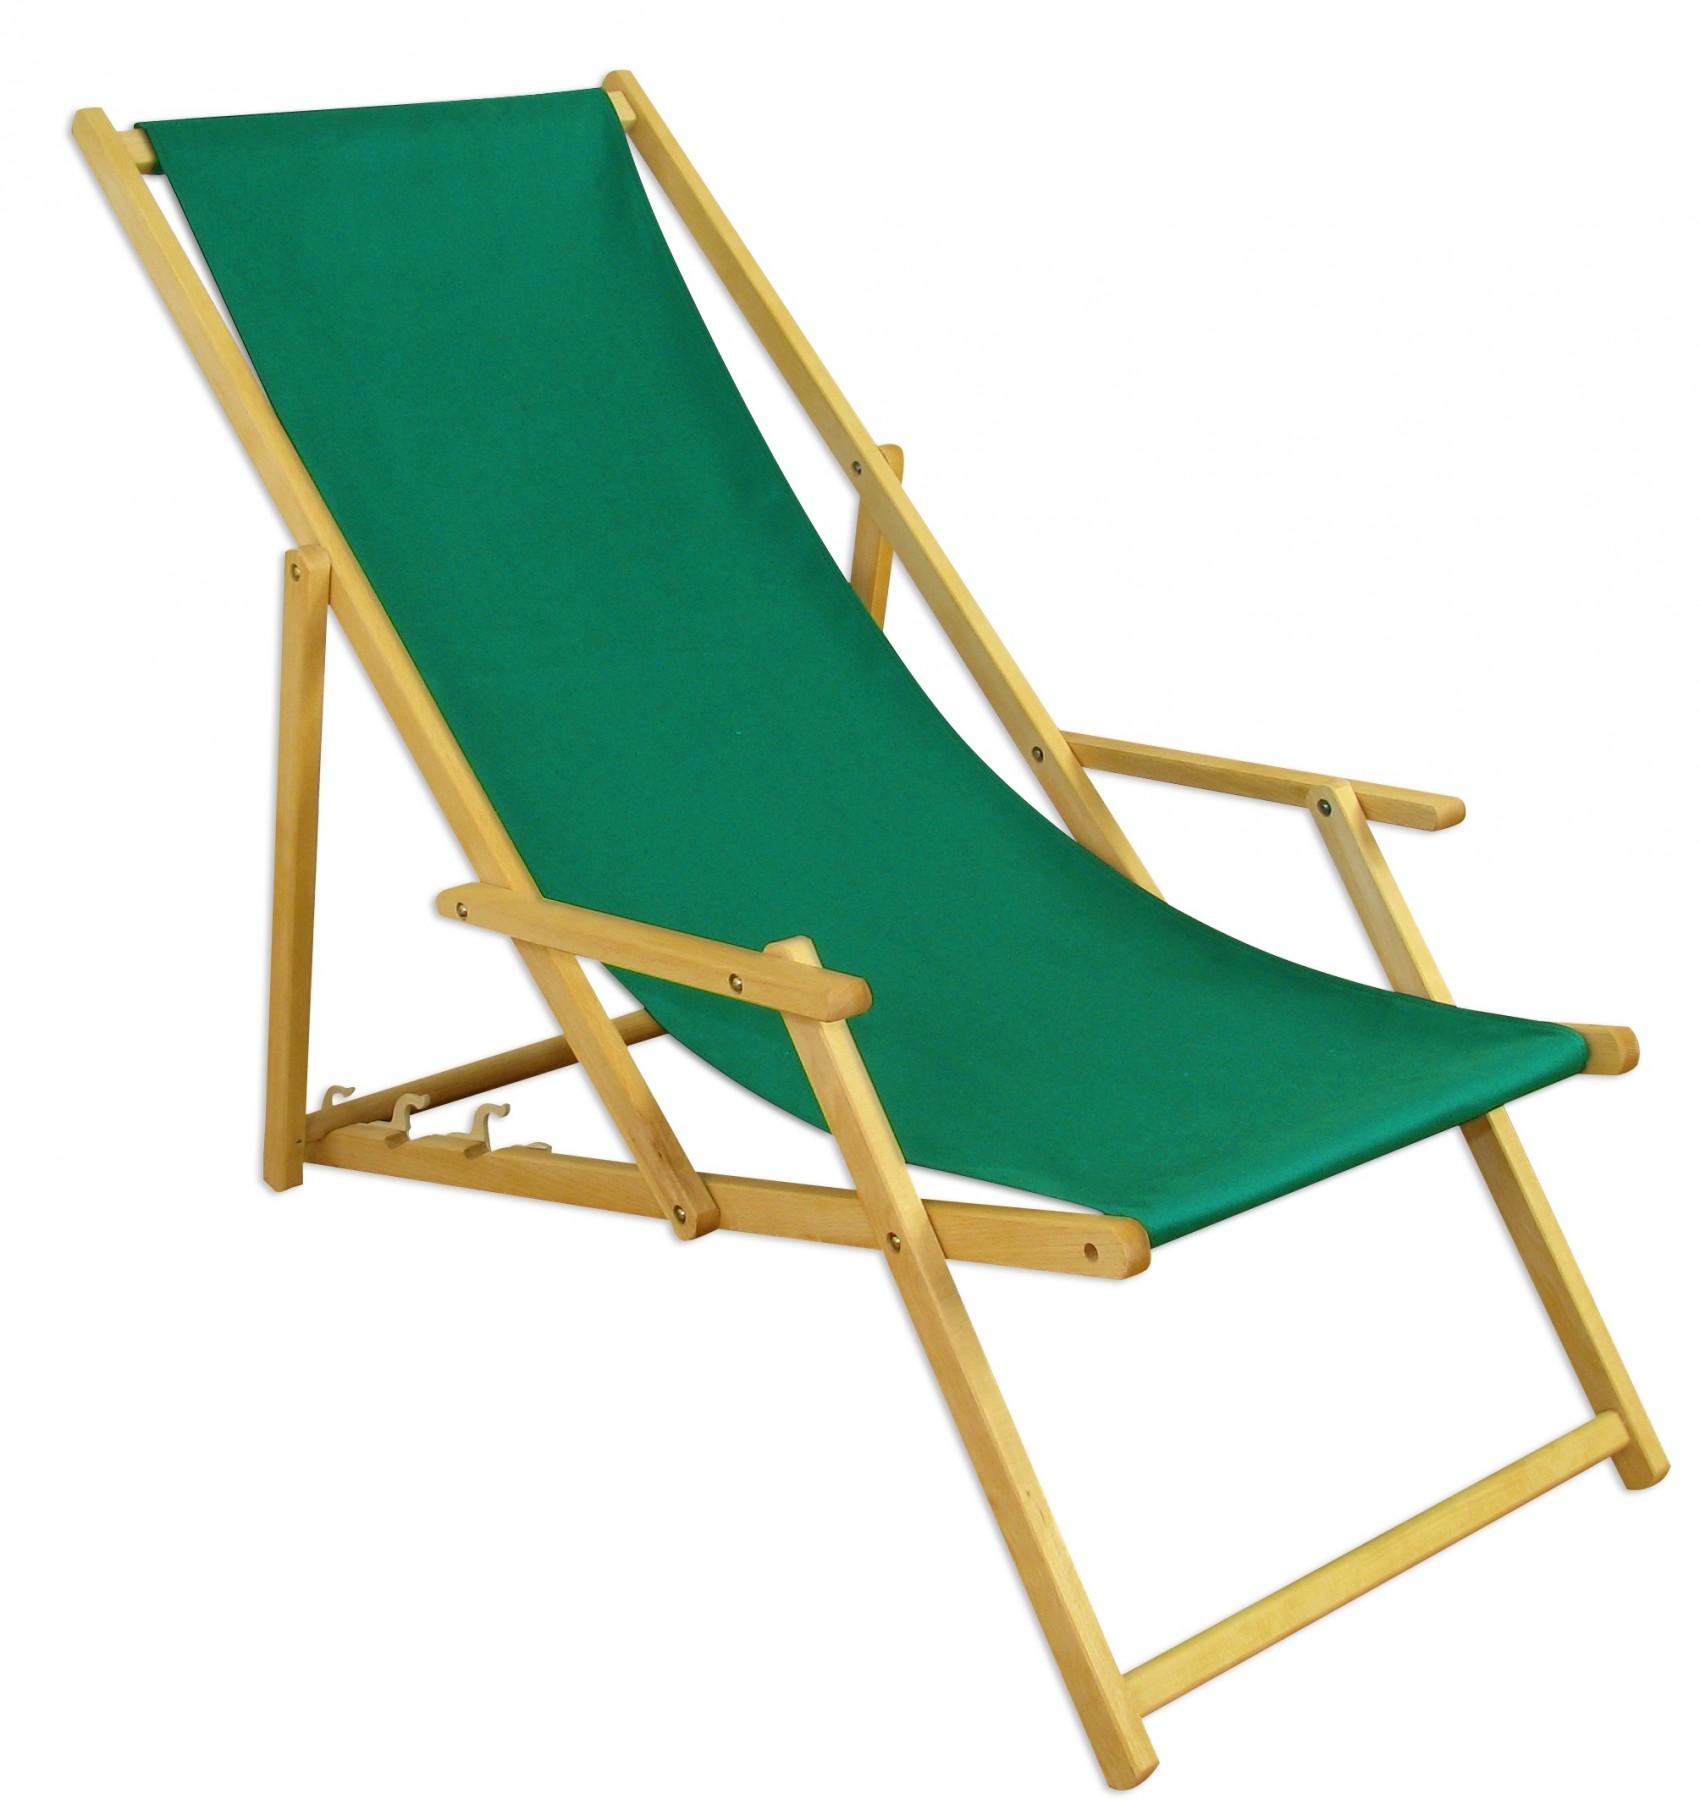 Sedia a sdraio sdraio giardino sedia sdraio lettino for Sedia sdraio